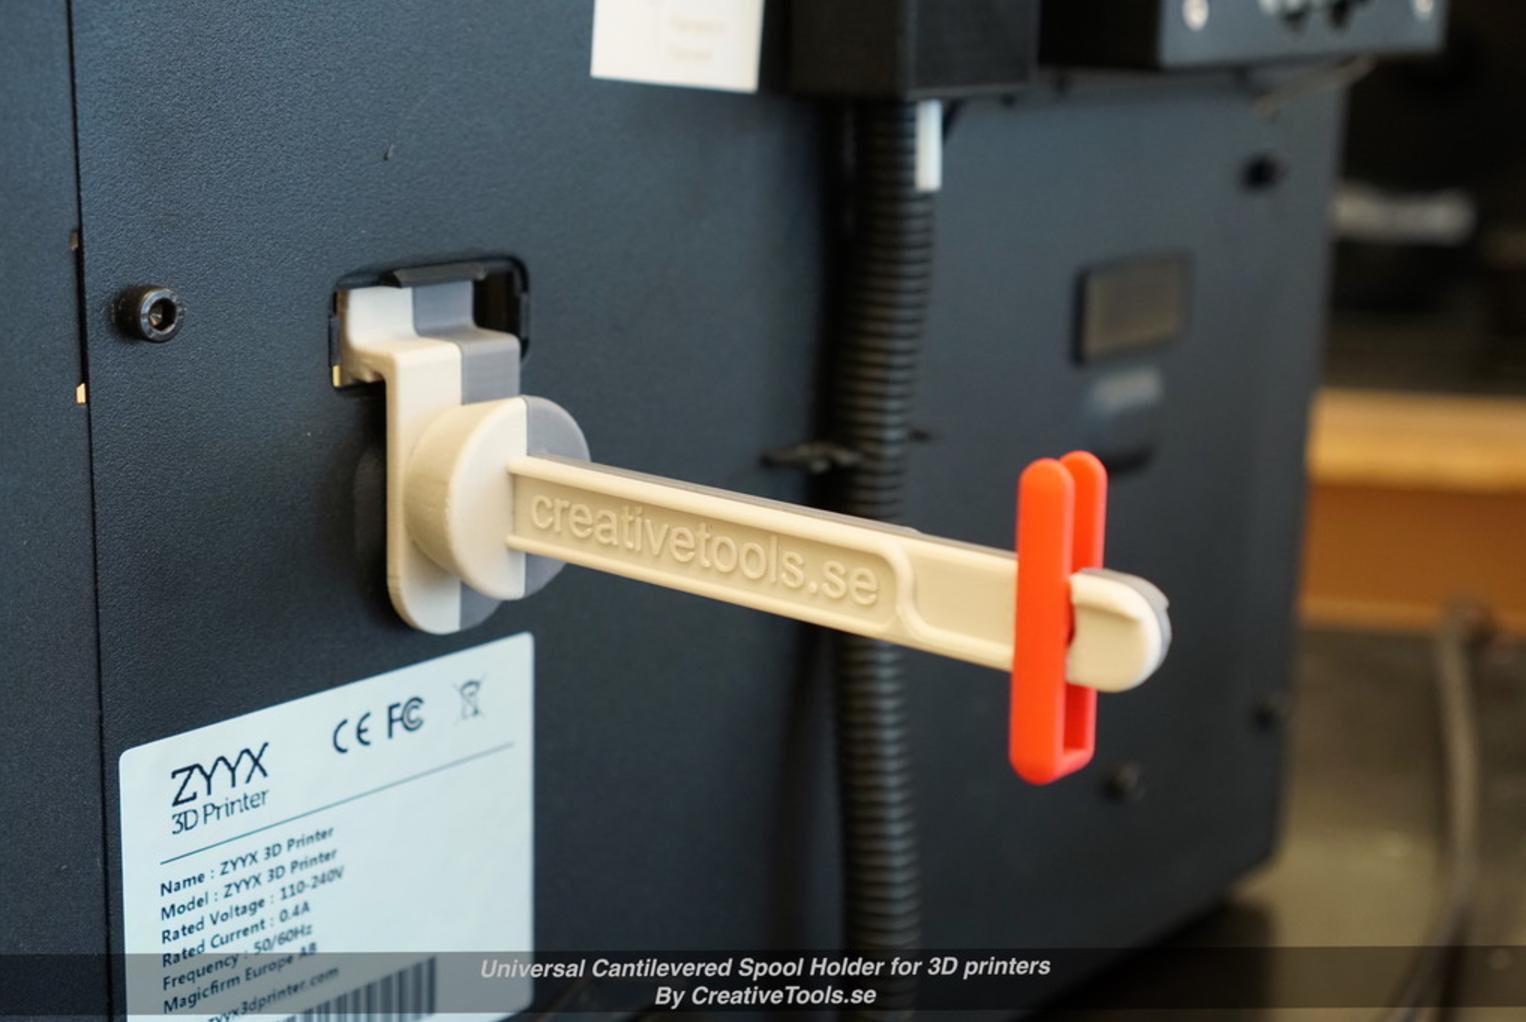 Capture d'écran 2017-05-09 à 09.44.42.png Download free STL file Universal Cantilevered Spool Holder for 3D printers • 3D printing design, CreativeTools